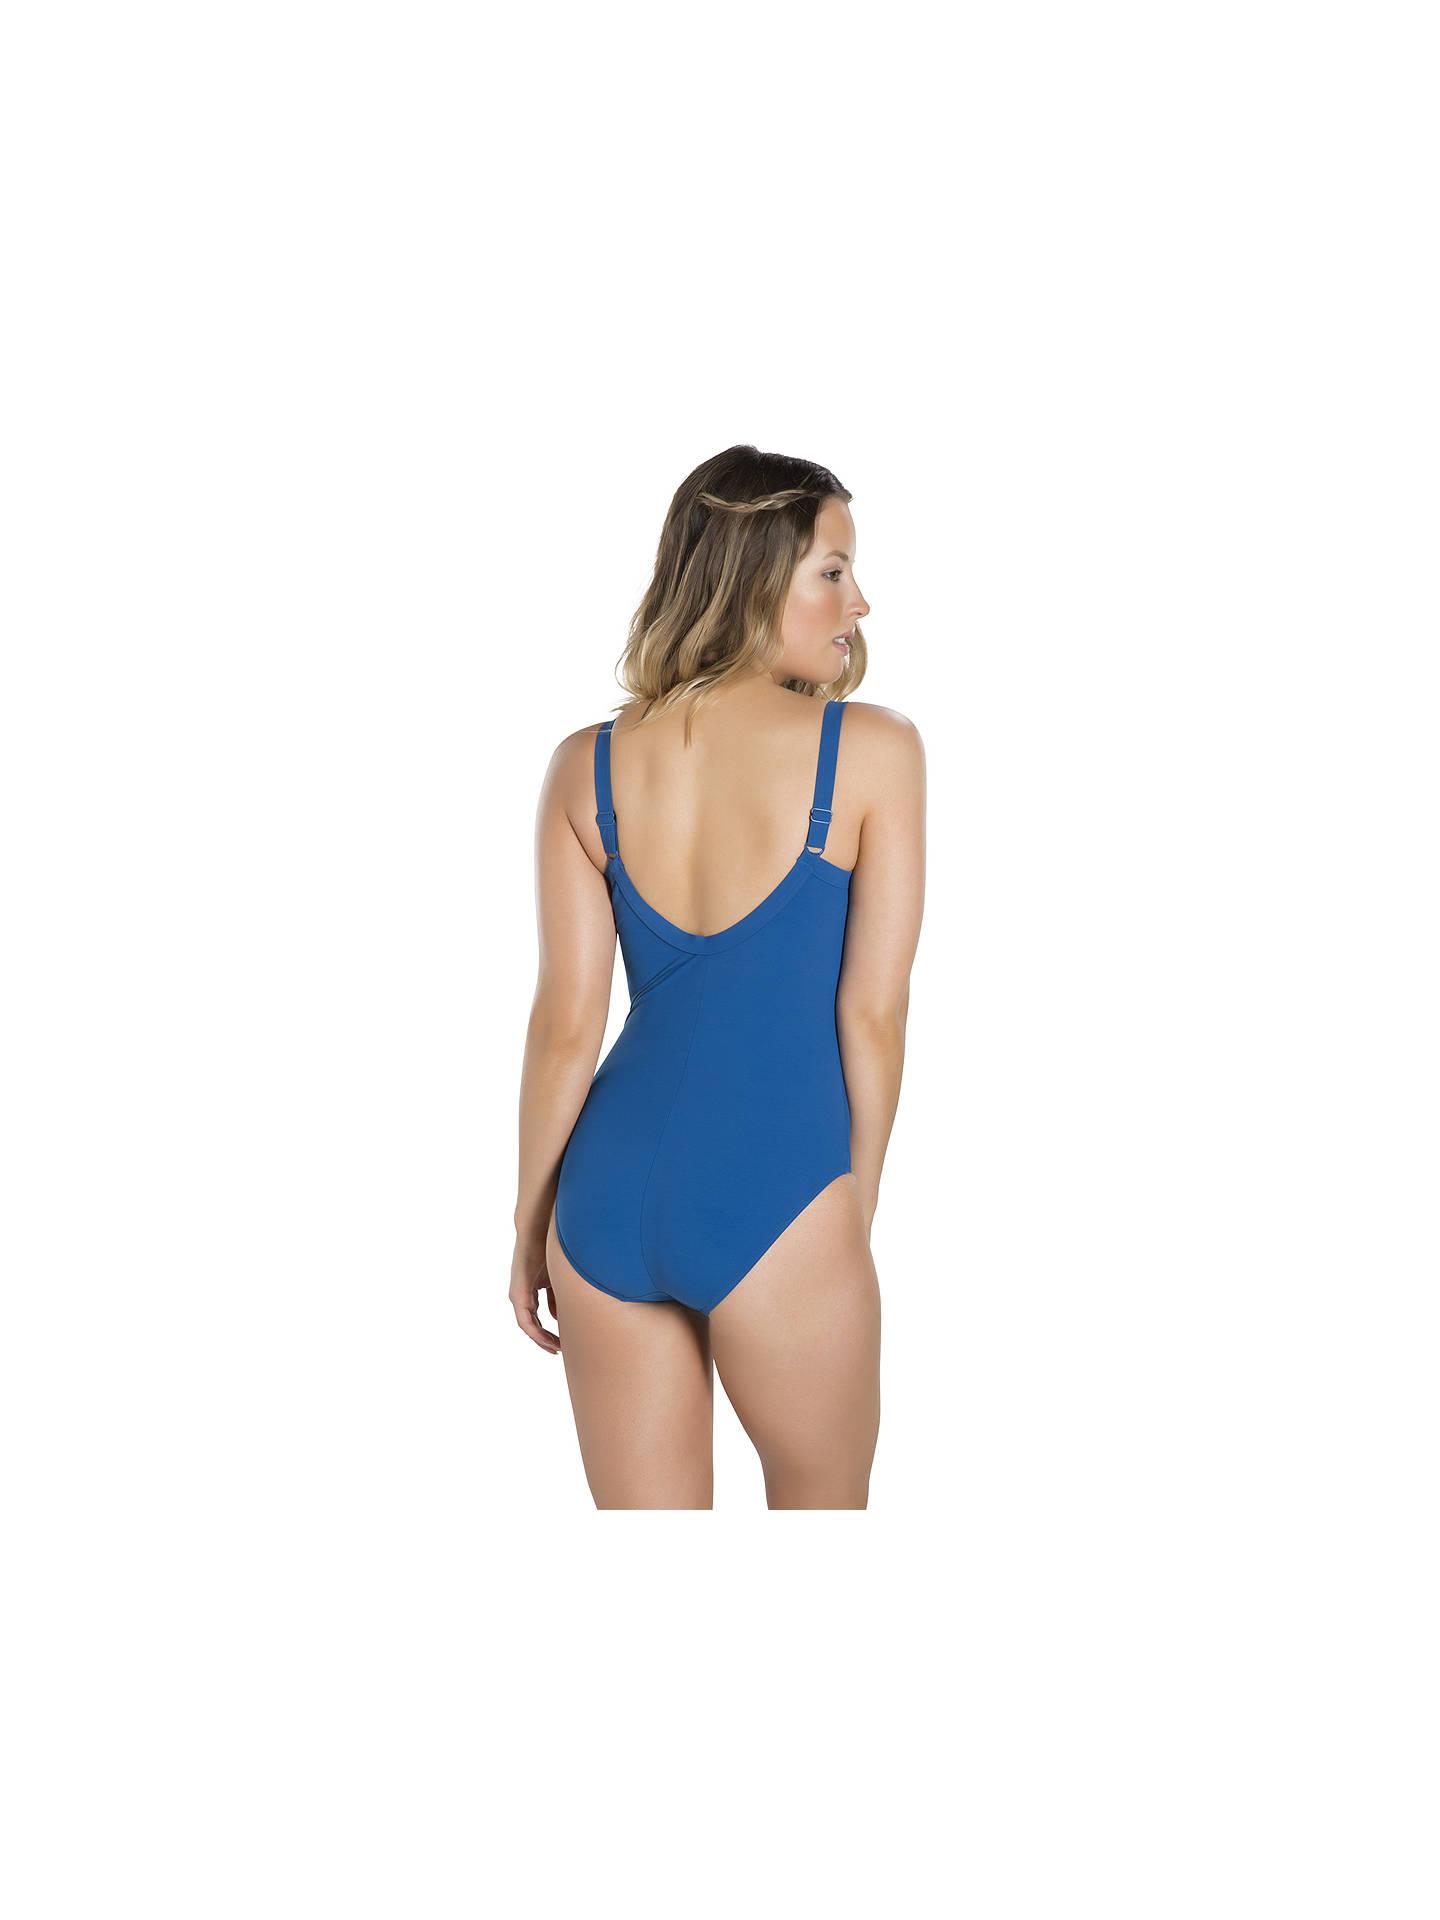 274b04d76d057 ... Buy Speedo Sculpture Watergem Swimsuit, Navy, 32 Online at johnlewis.com